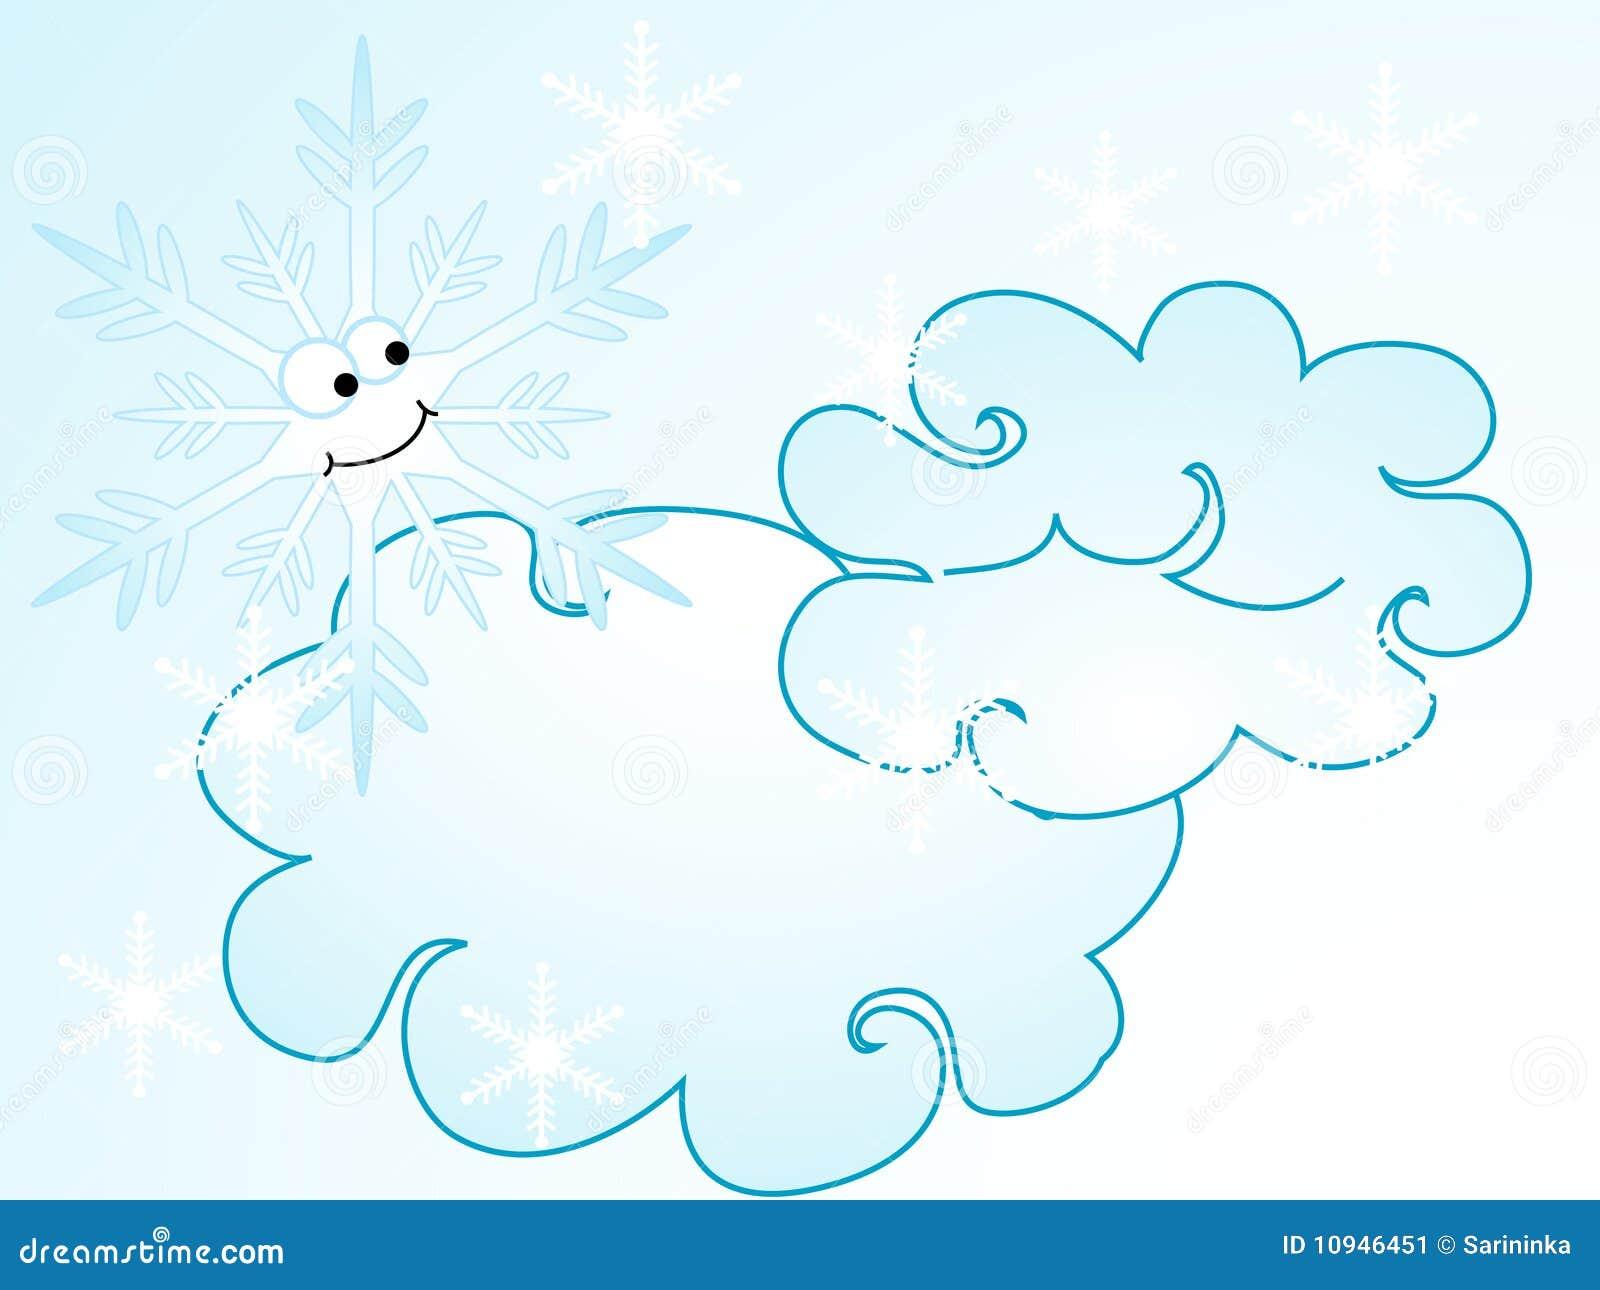 Cartoon snowflake stock vector. Illustration of snowflake ...